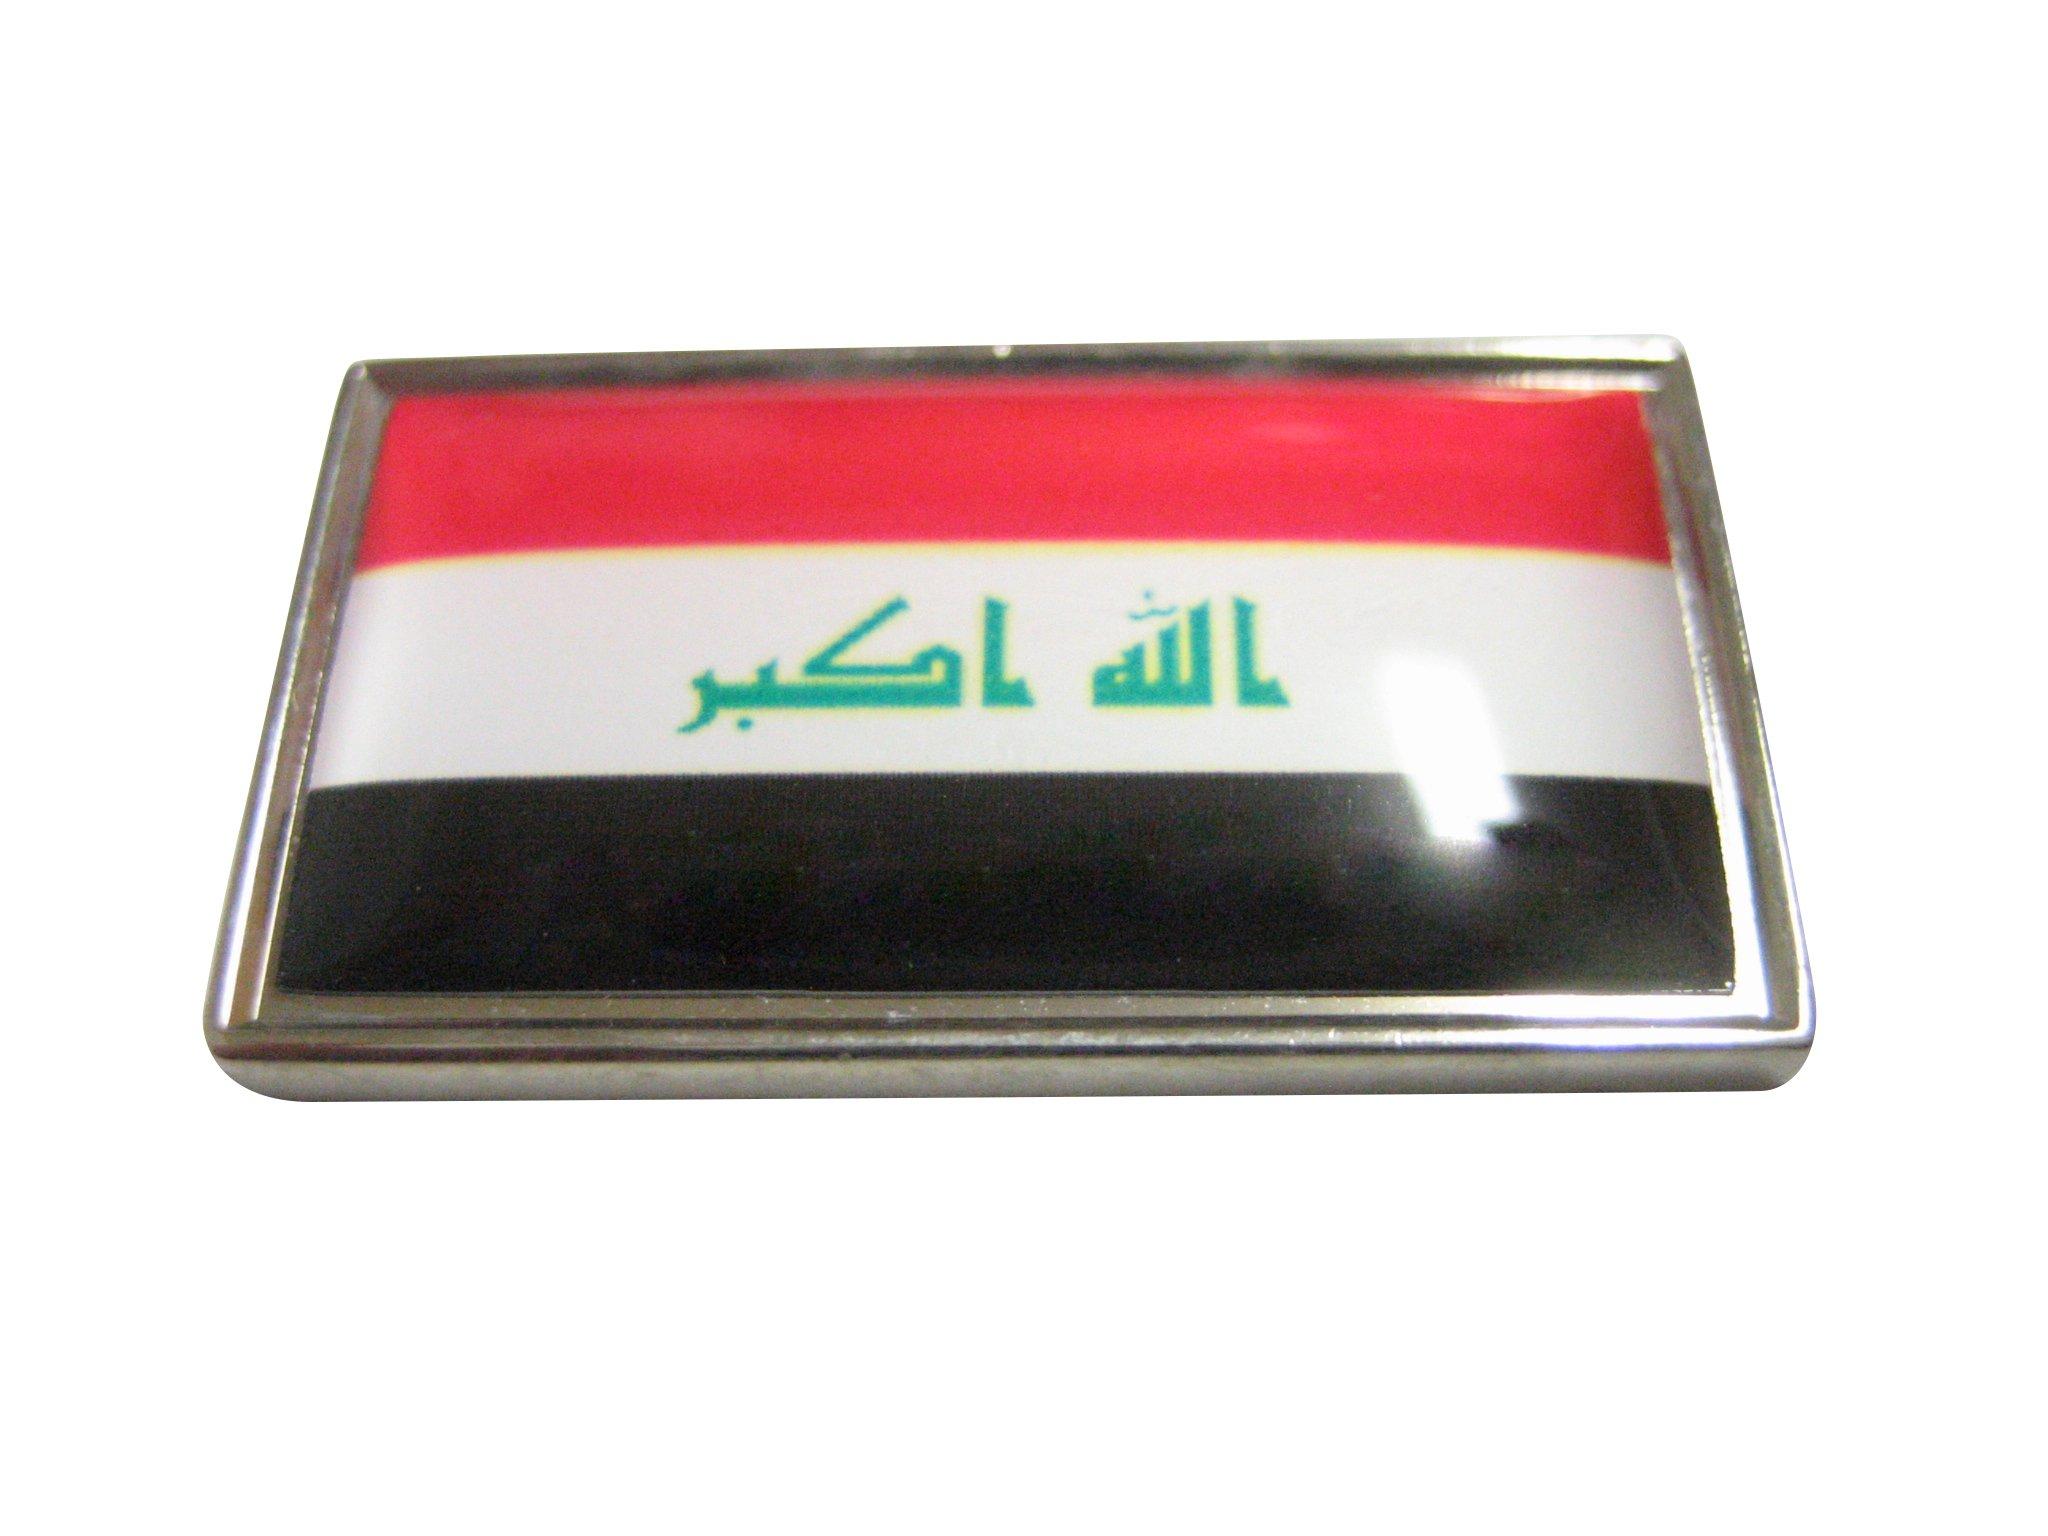 Thin Bordered Iraq Flag Pendant Magnet Iraq Flag Rare Earth Magnets Magnets